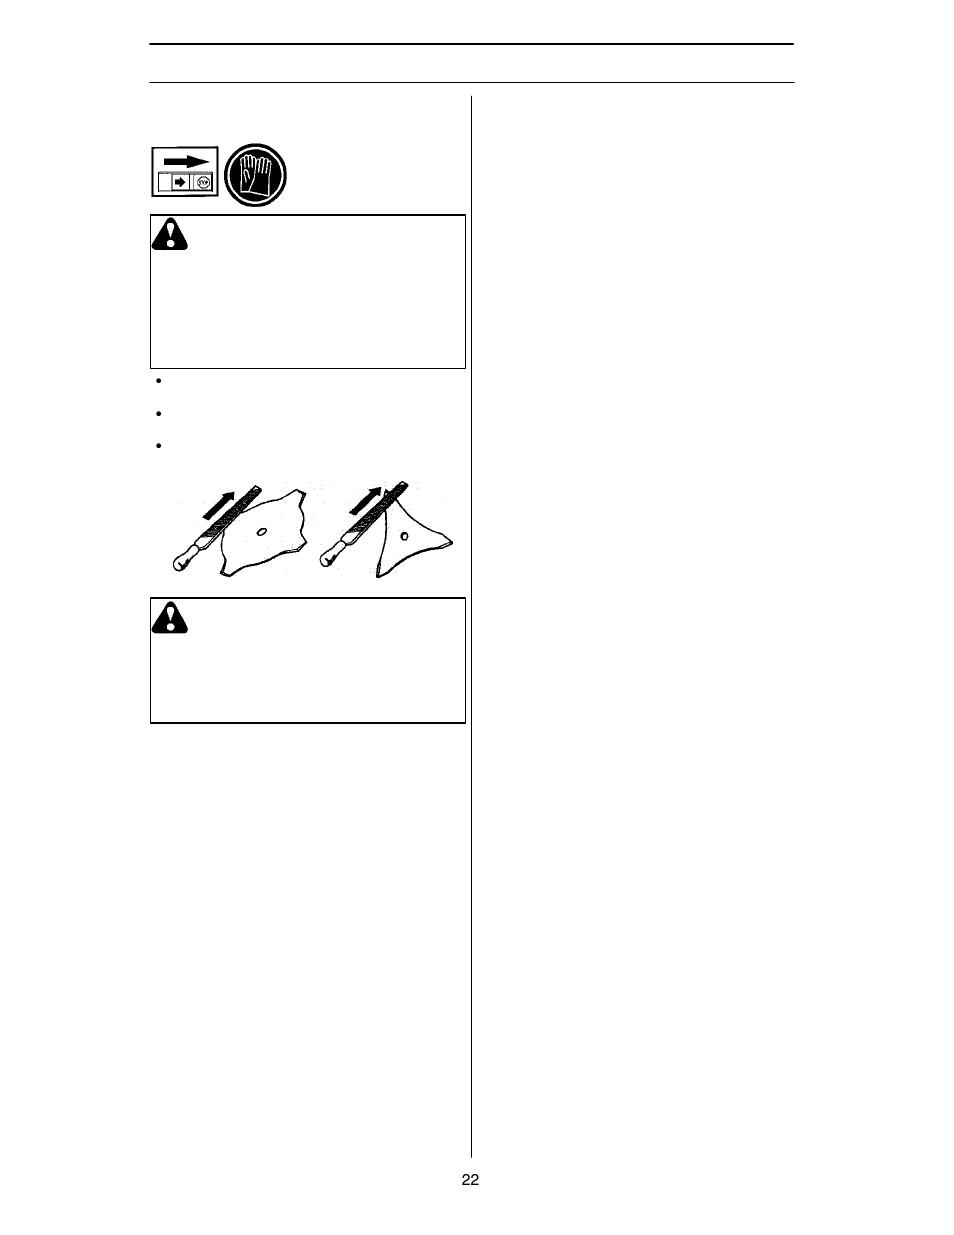 Maintenance, Sharpening grass cutters and grass blades, Warning   Husqvarna  125R User Manual  